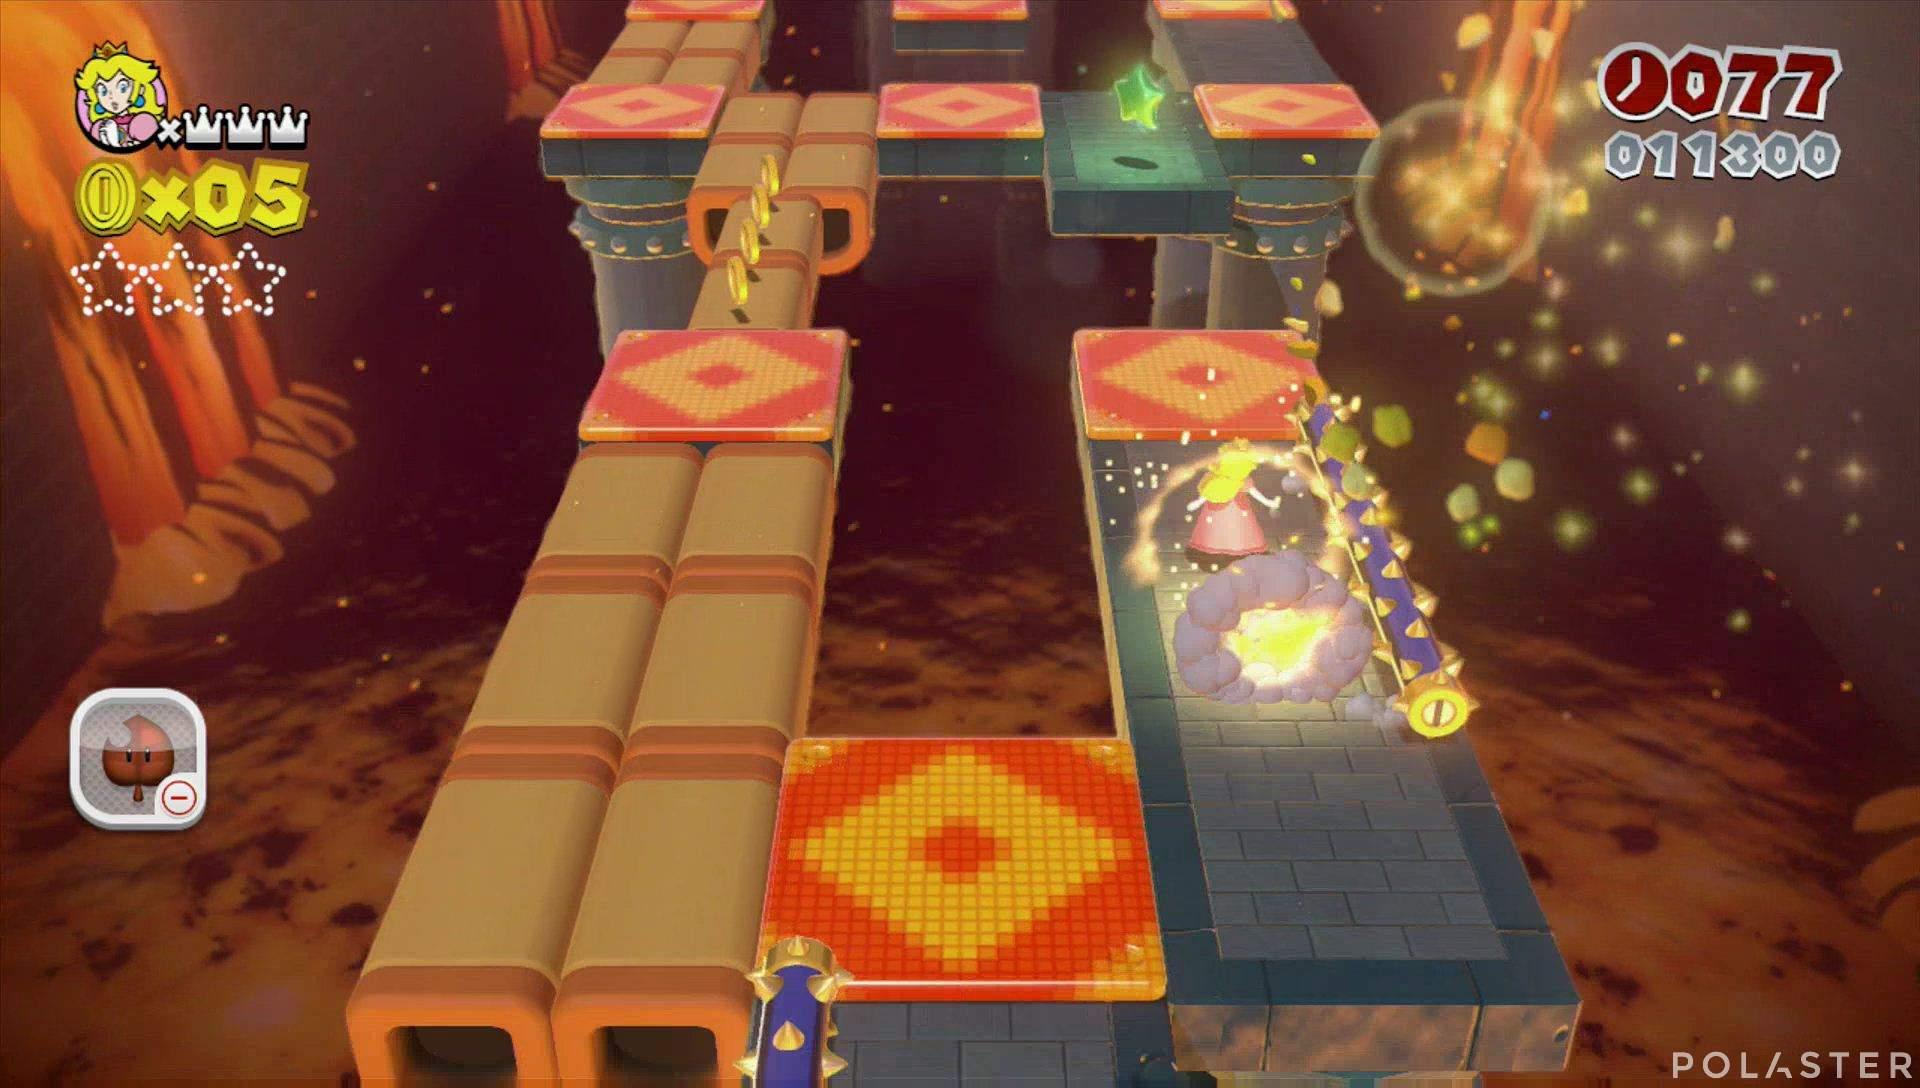 Super Mario 3D World Mundo Castillo-3 Estrella 1